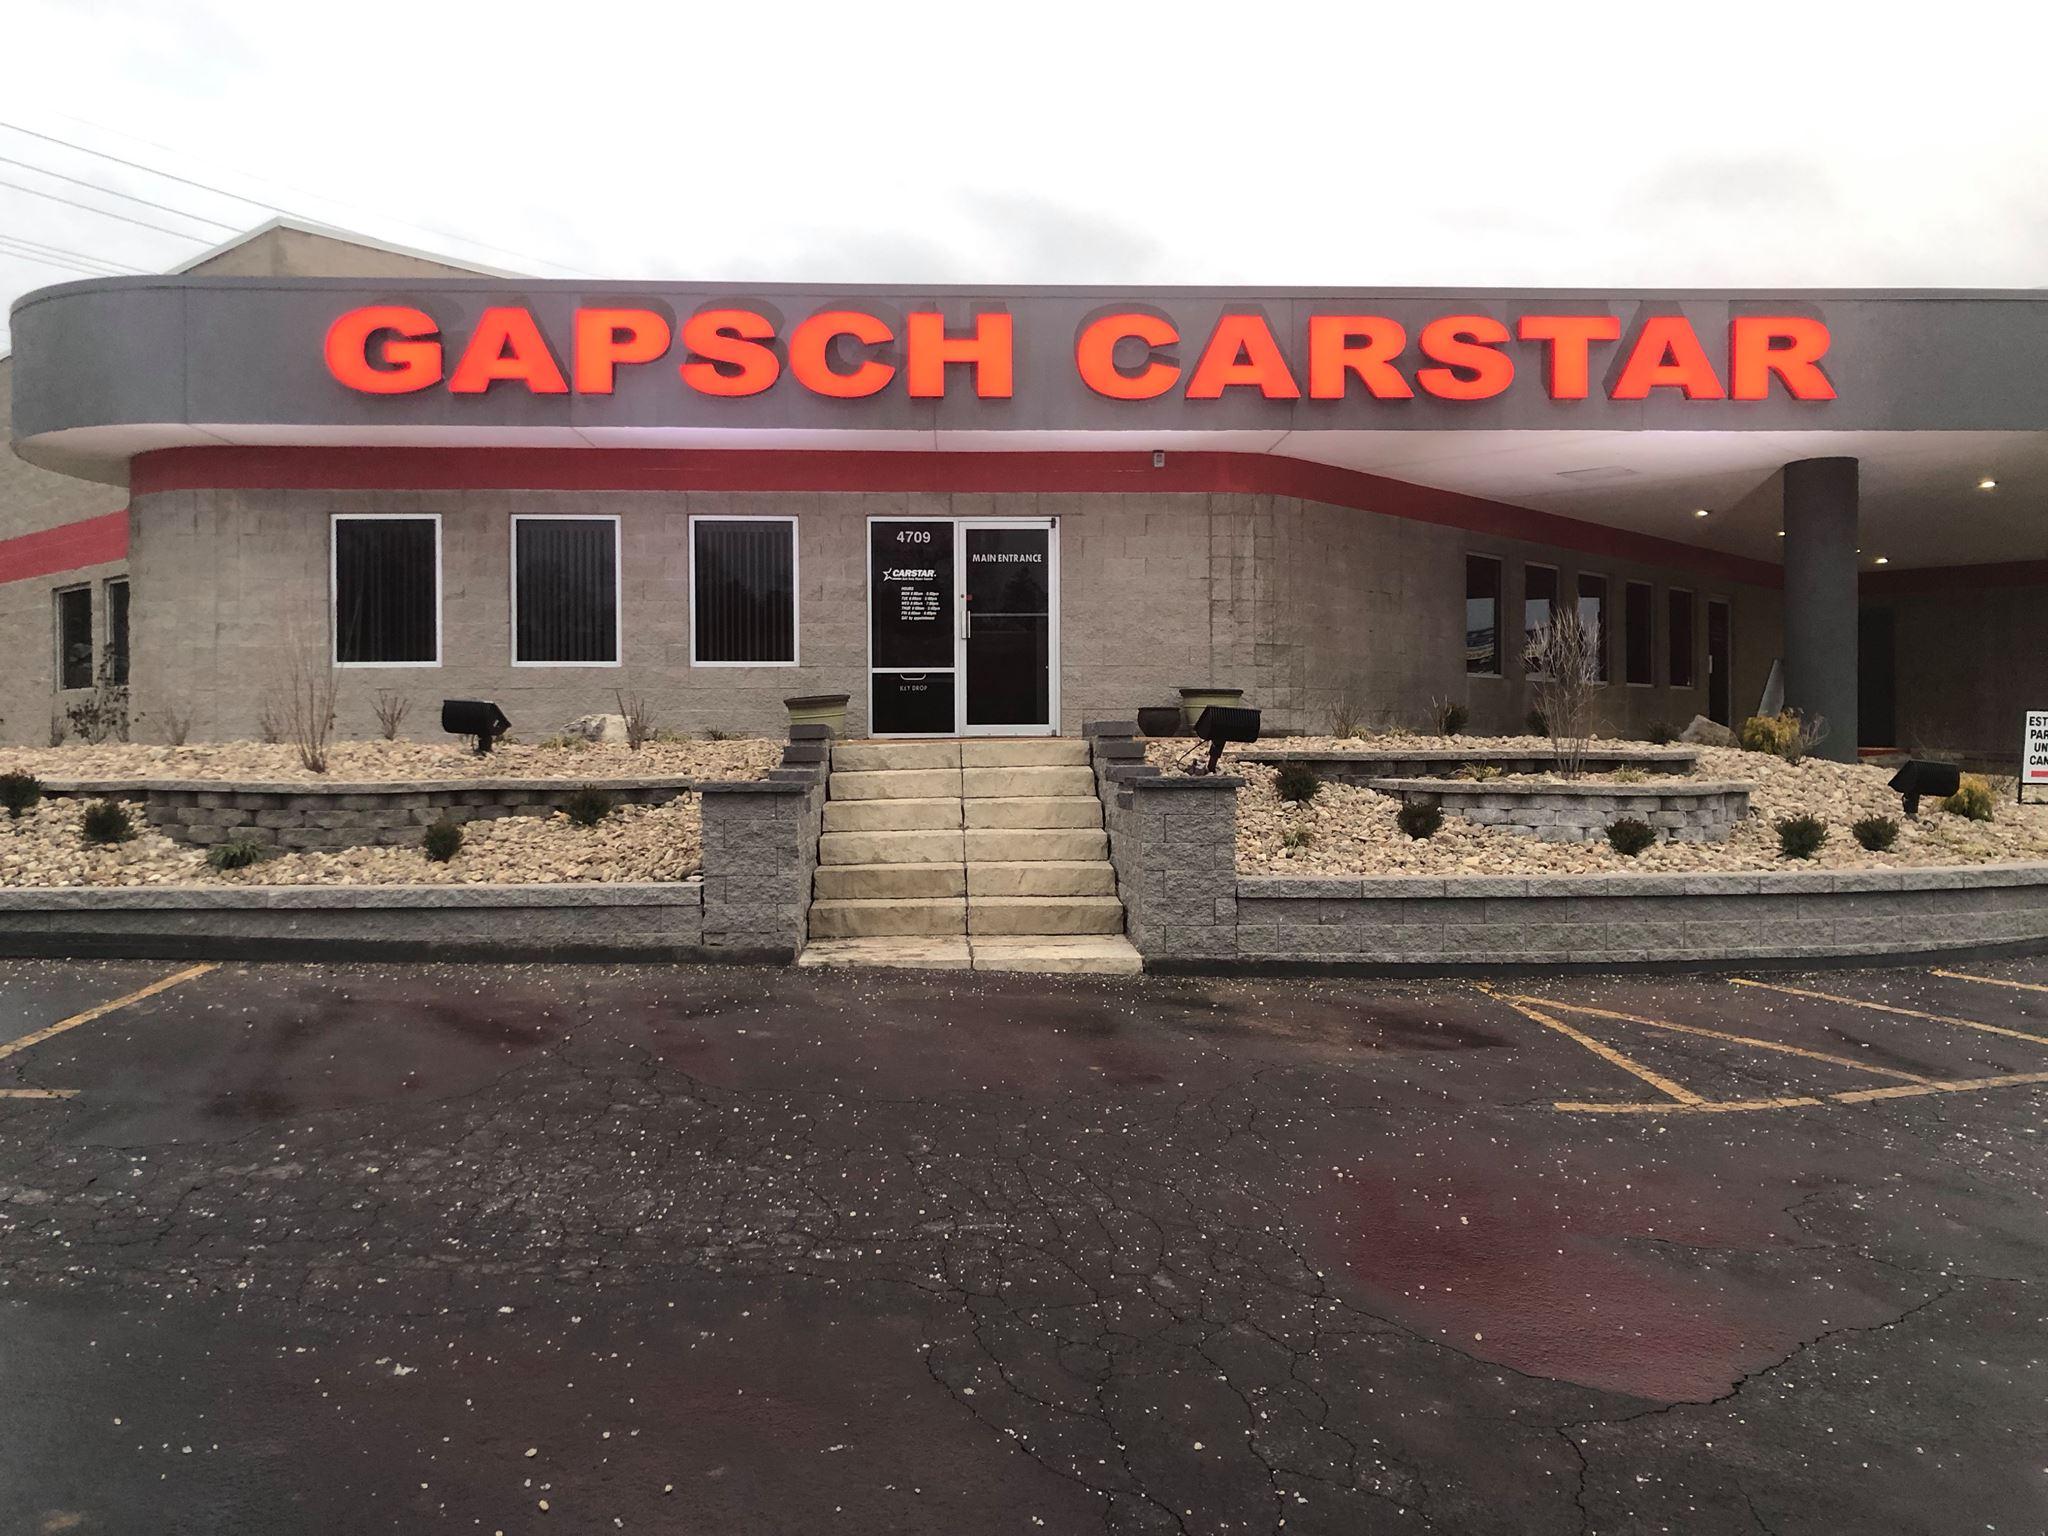 Auto Body Shop Gapsch Carstar Collision Center In St Louis Mo